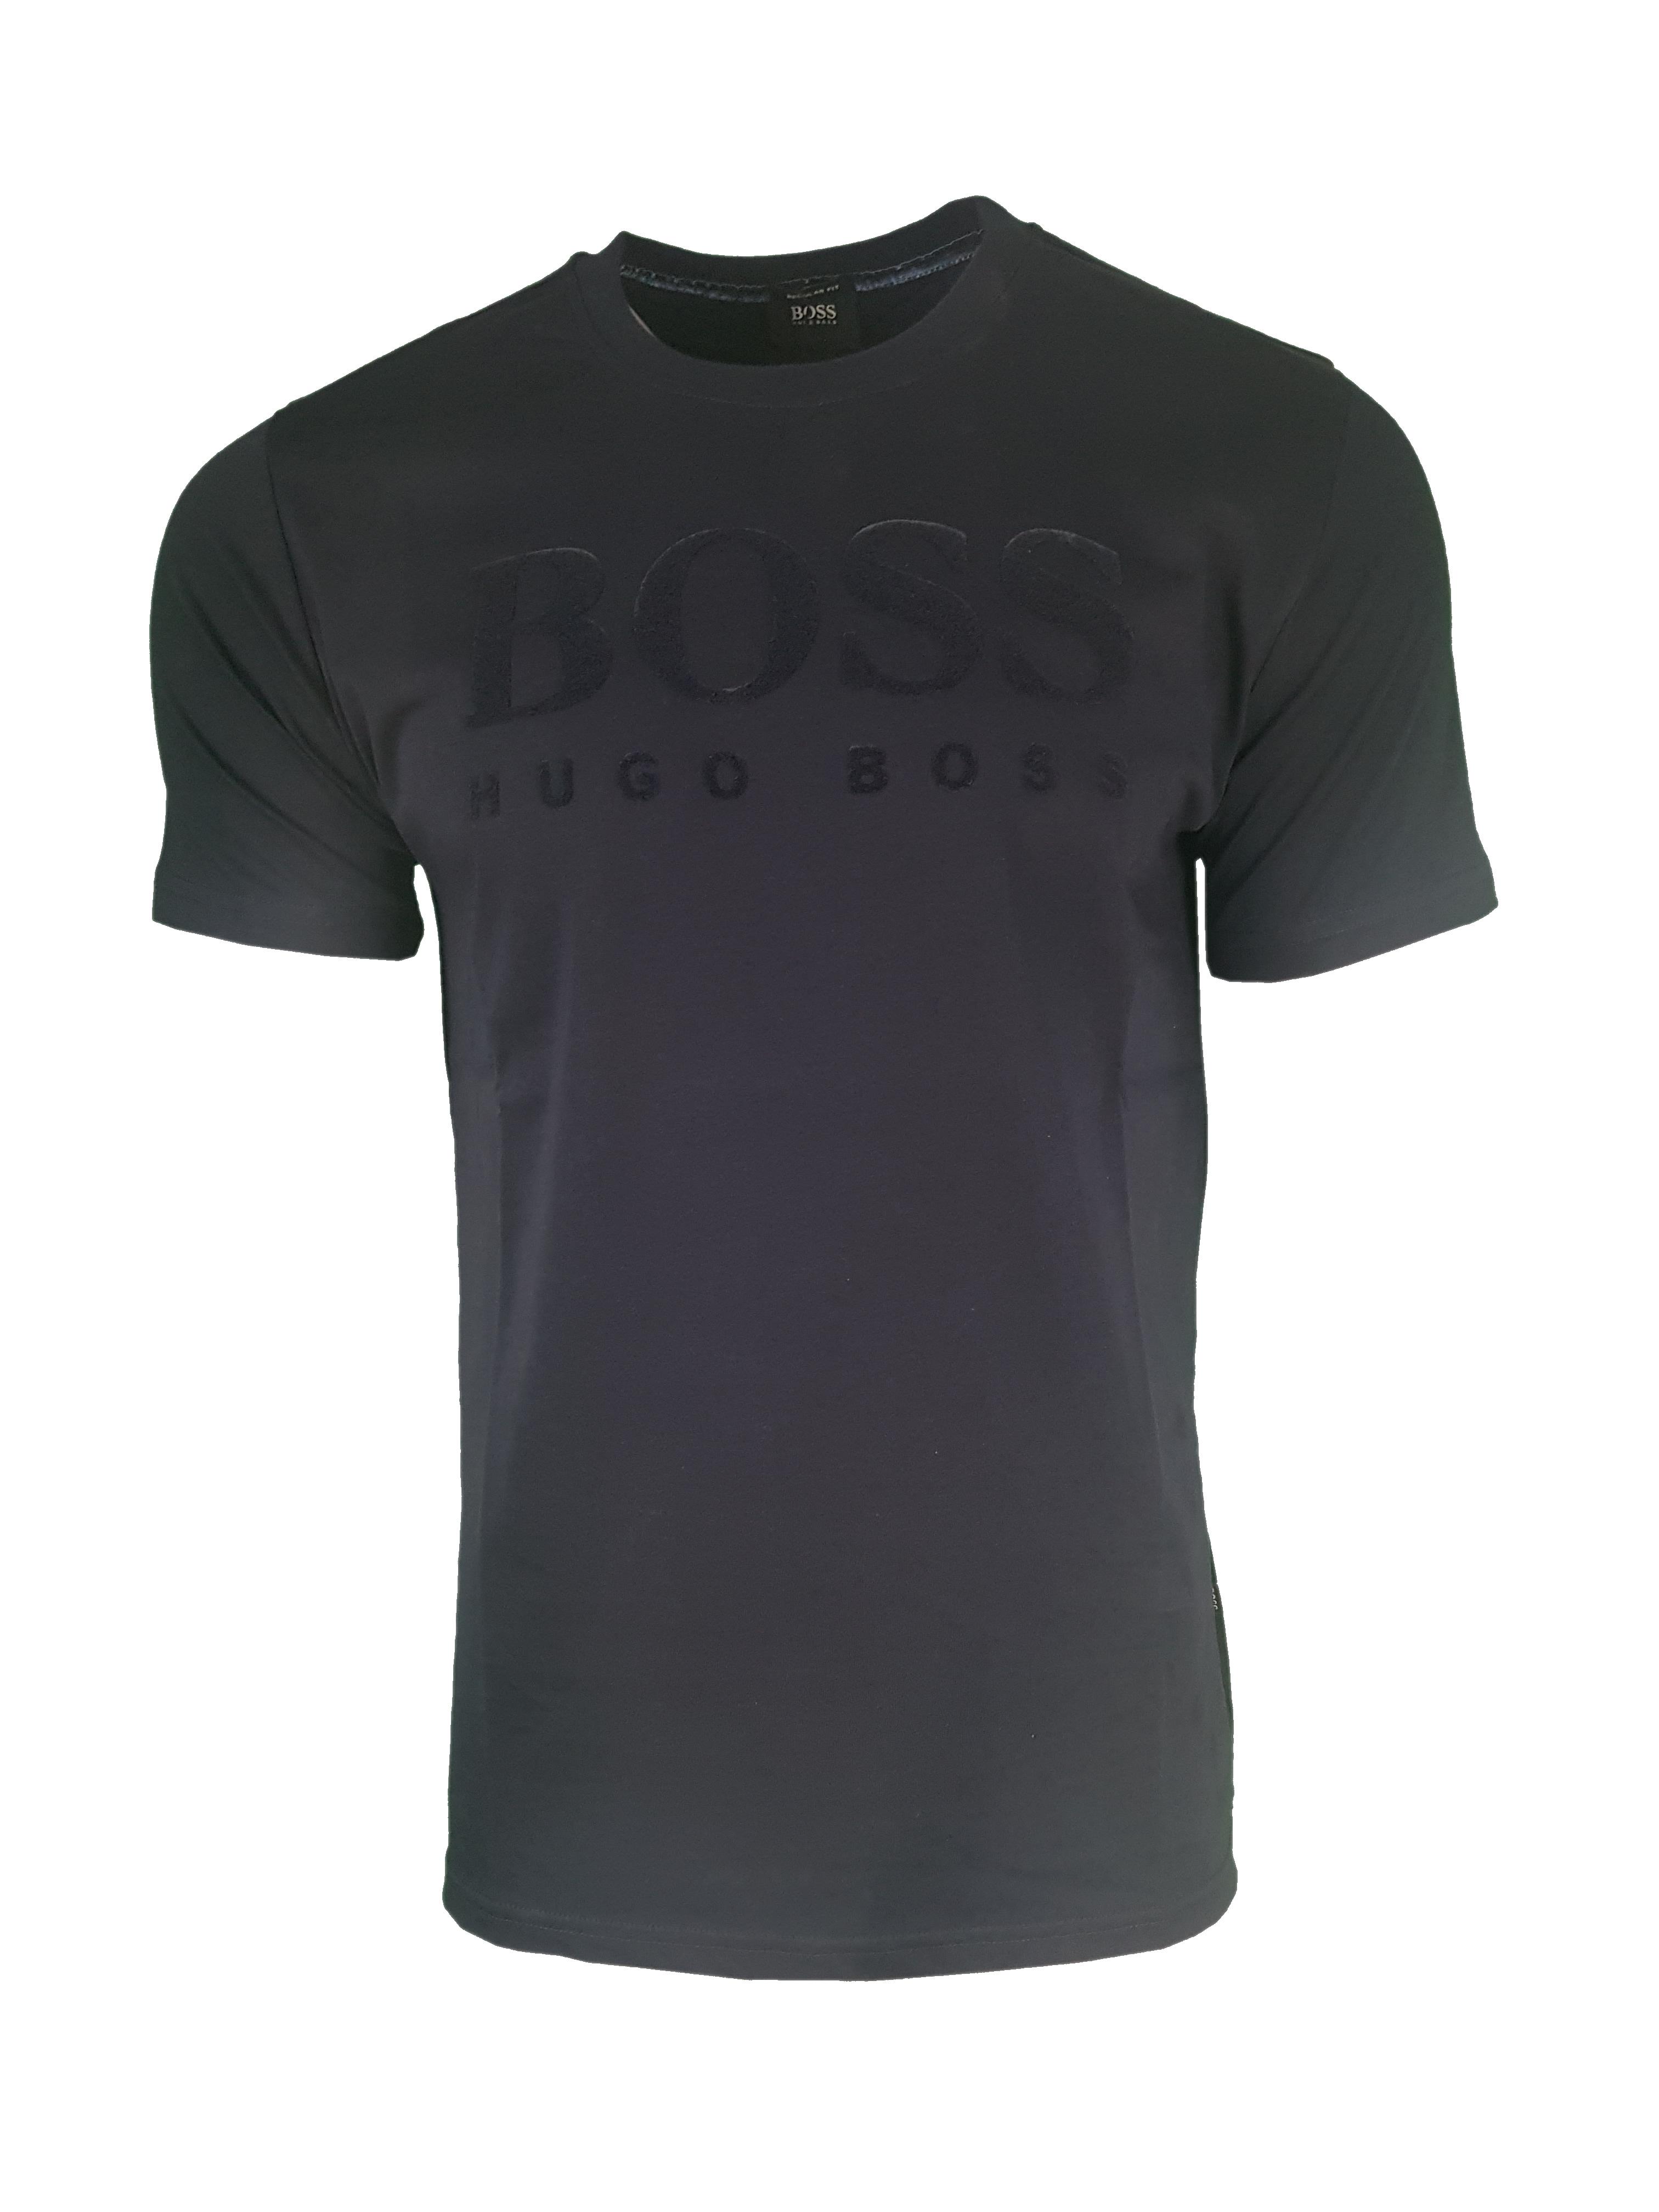 8100bd7b Hugo Boss Flock Print Chest Logo. Short Sleeve Crew T Shirt in Dark ...